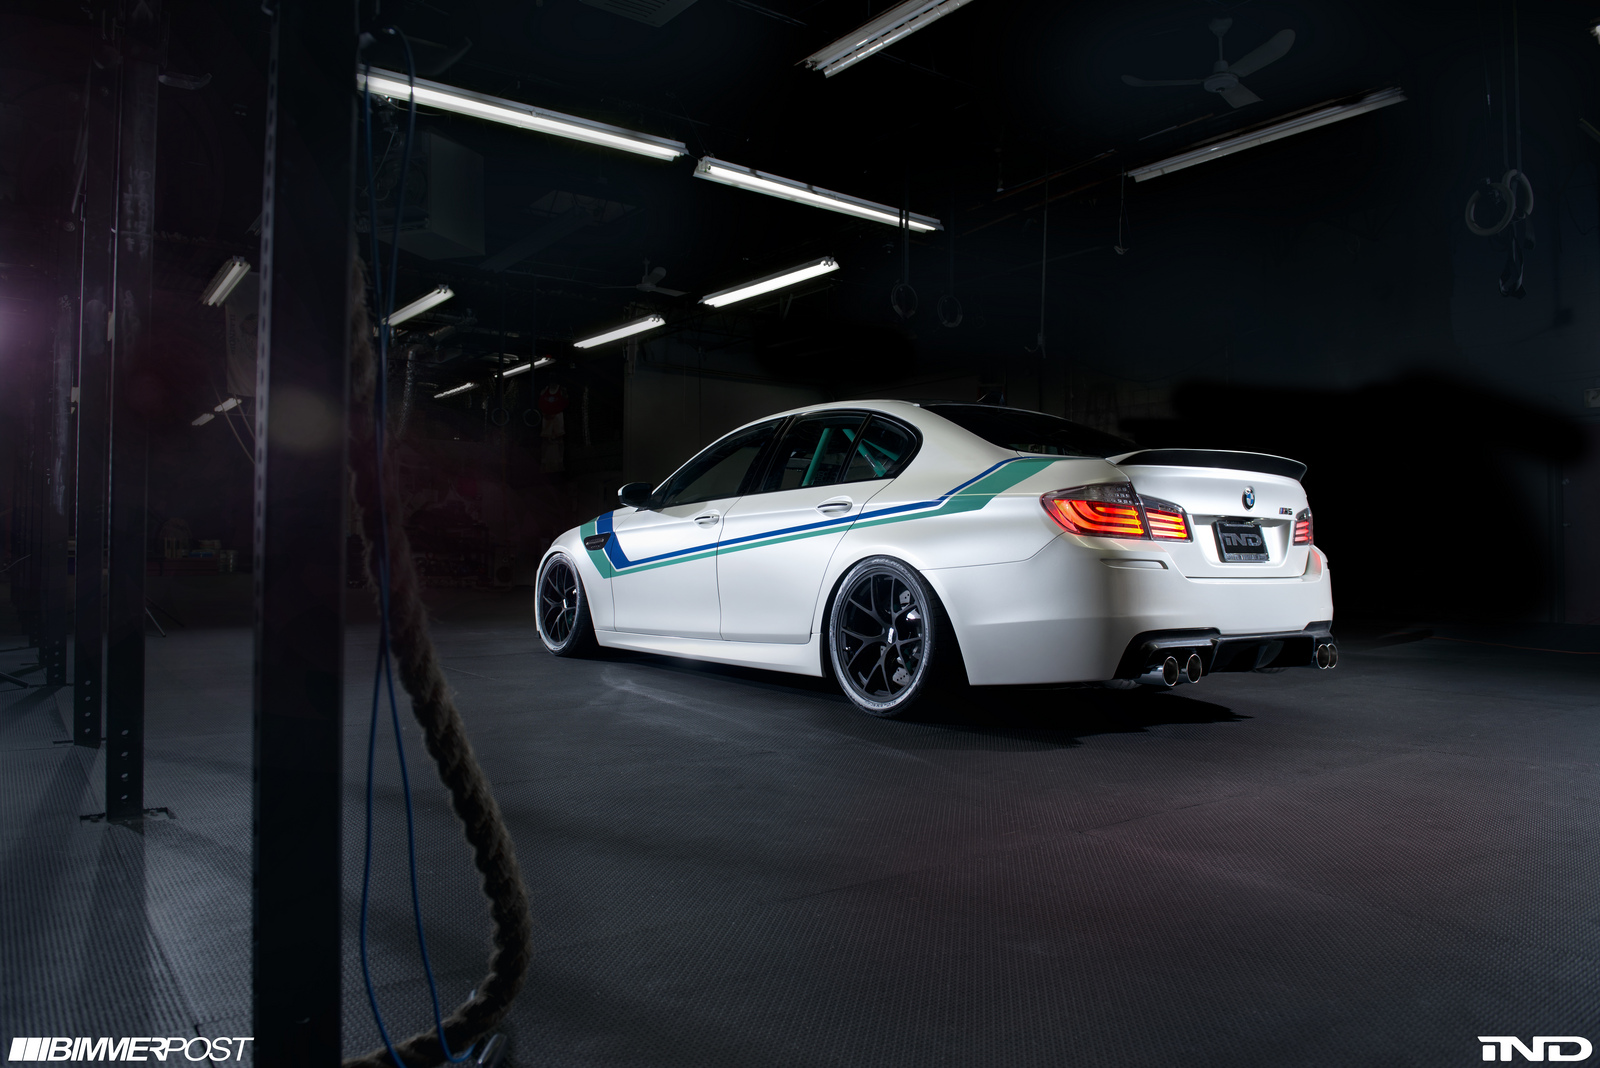 IND F10 BMW M5